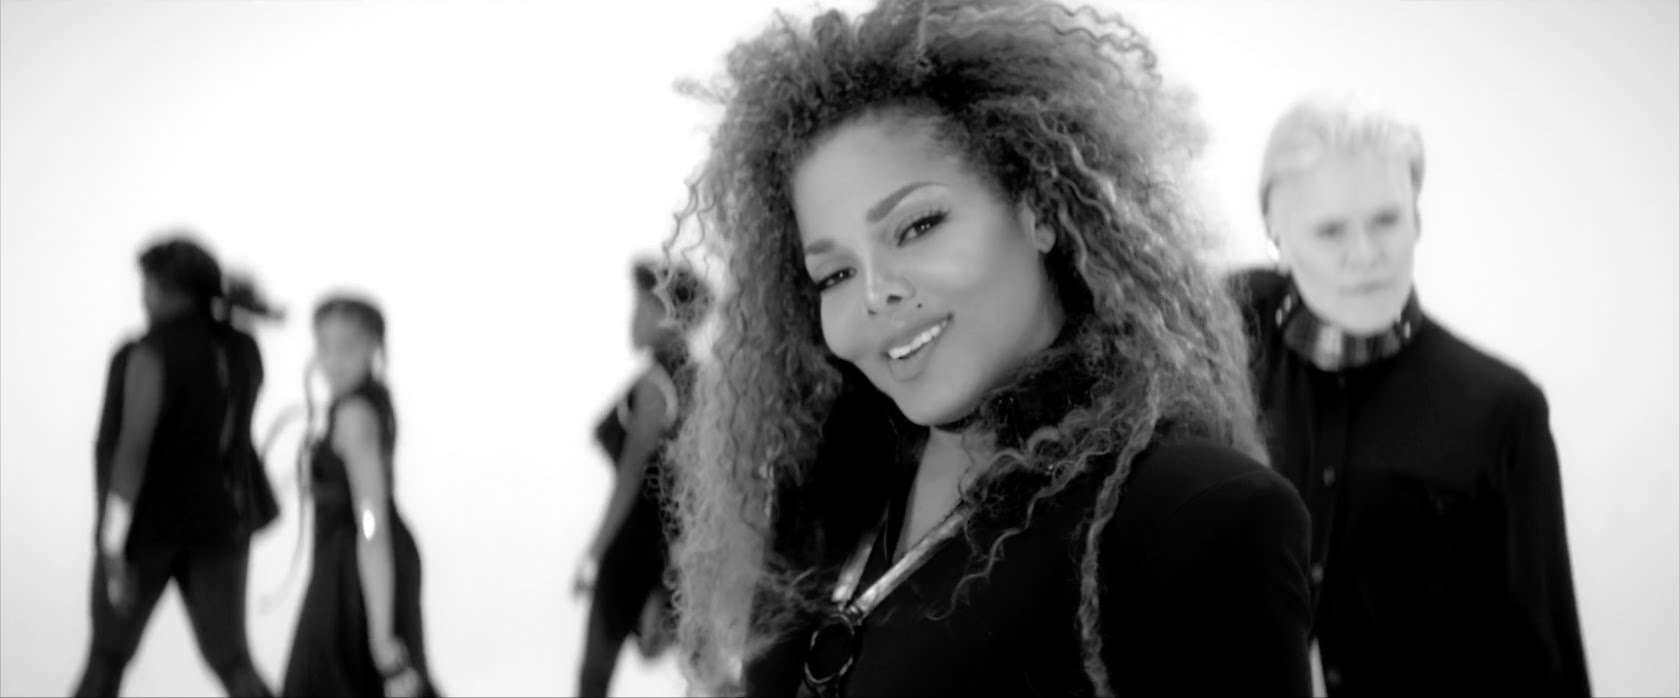 Janet Jackson - Dammn Baby (Music Video) - YouTube